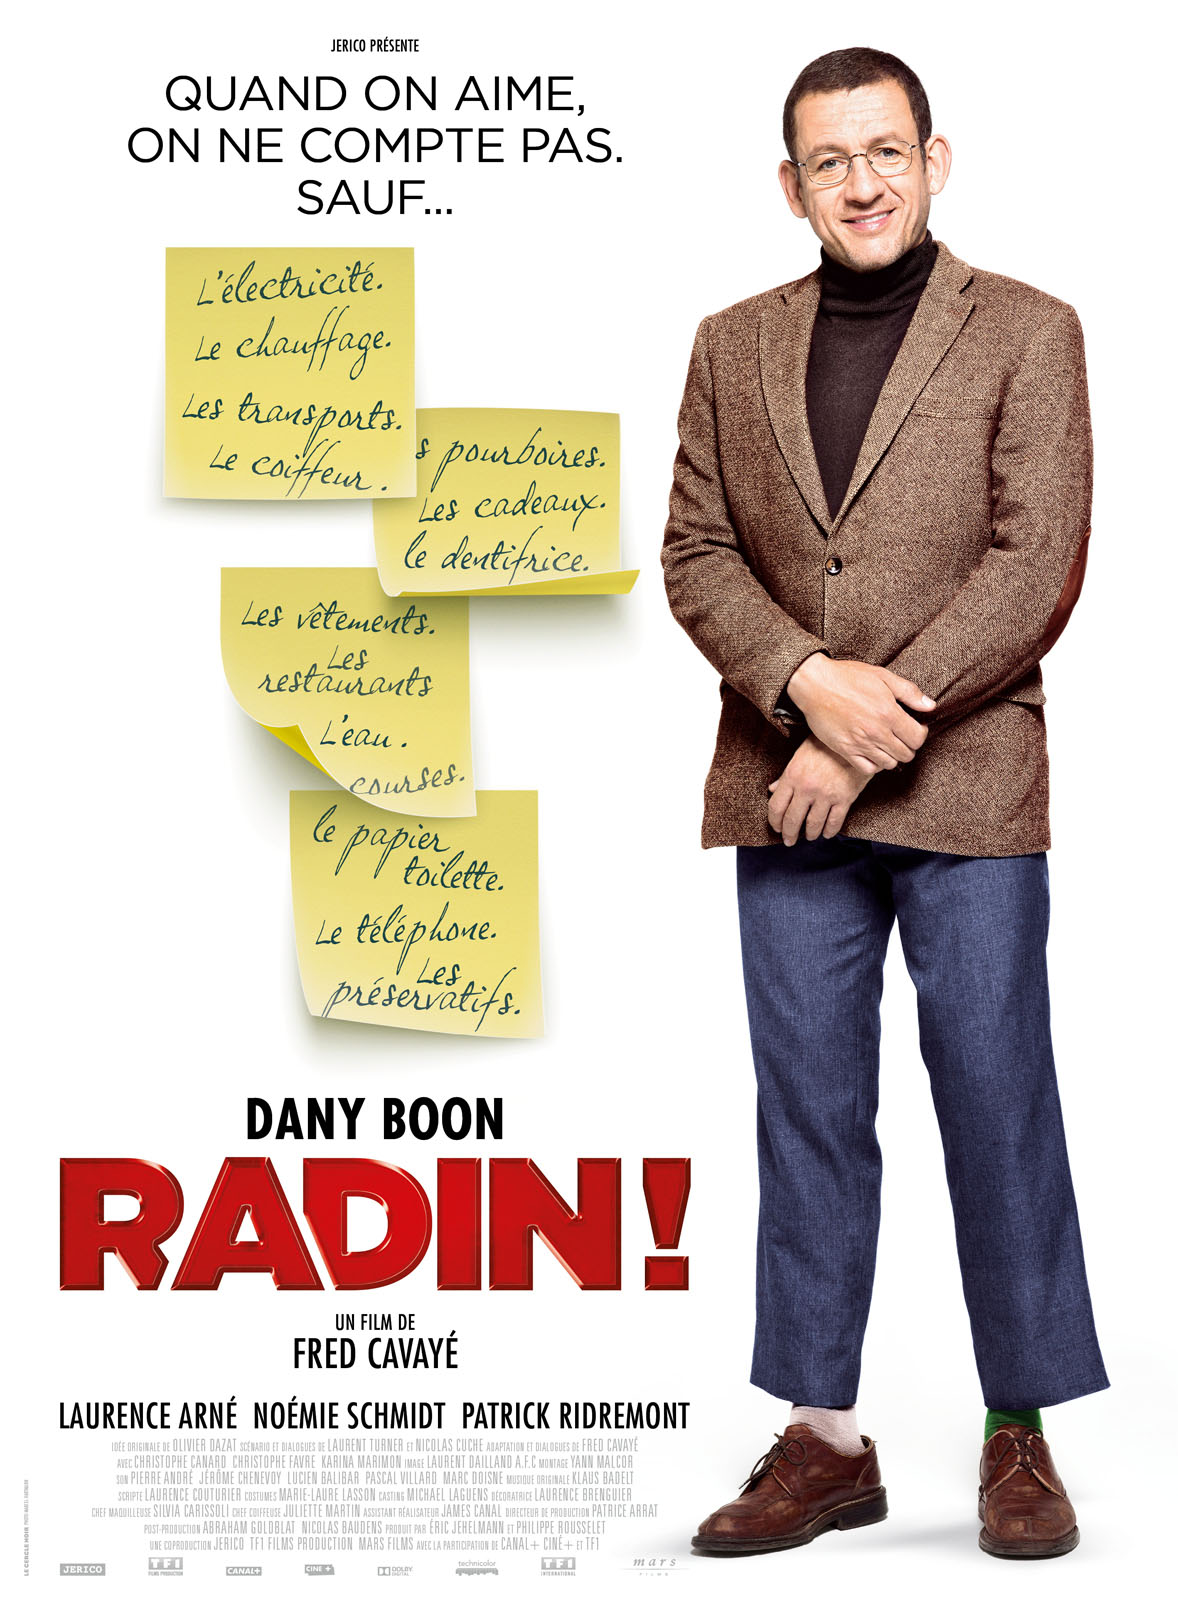 Achat Radin! en DVD - AlloCiné